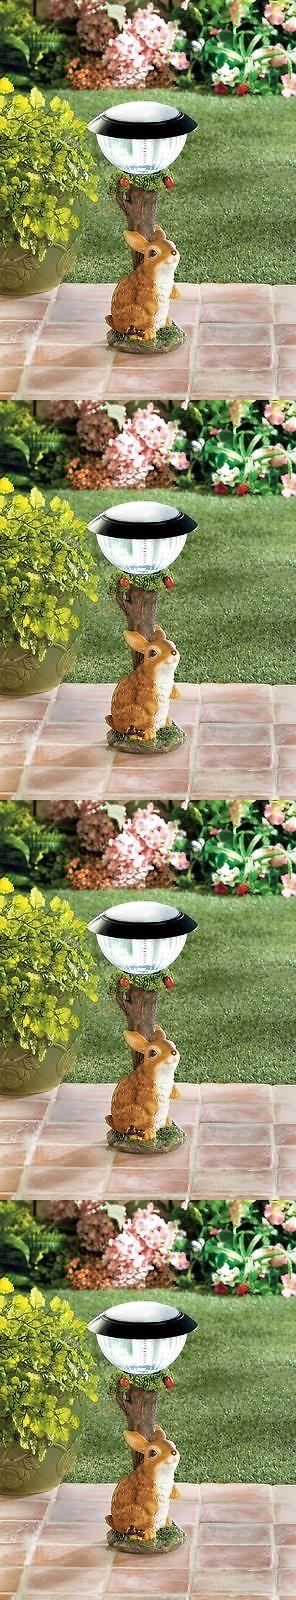 farm and garden: Rabbit Apple Tree Solar Power Light Path Yard Garden Patio Deck Outdoor Lamp BUY IT NOW ONLY: $45.34